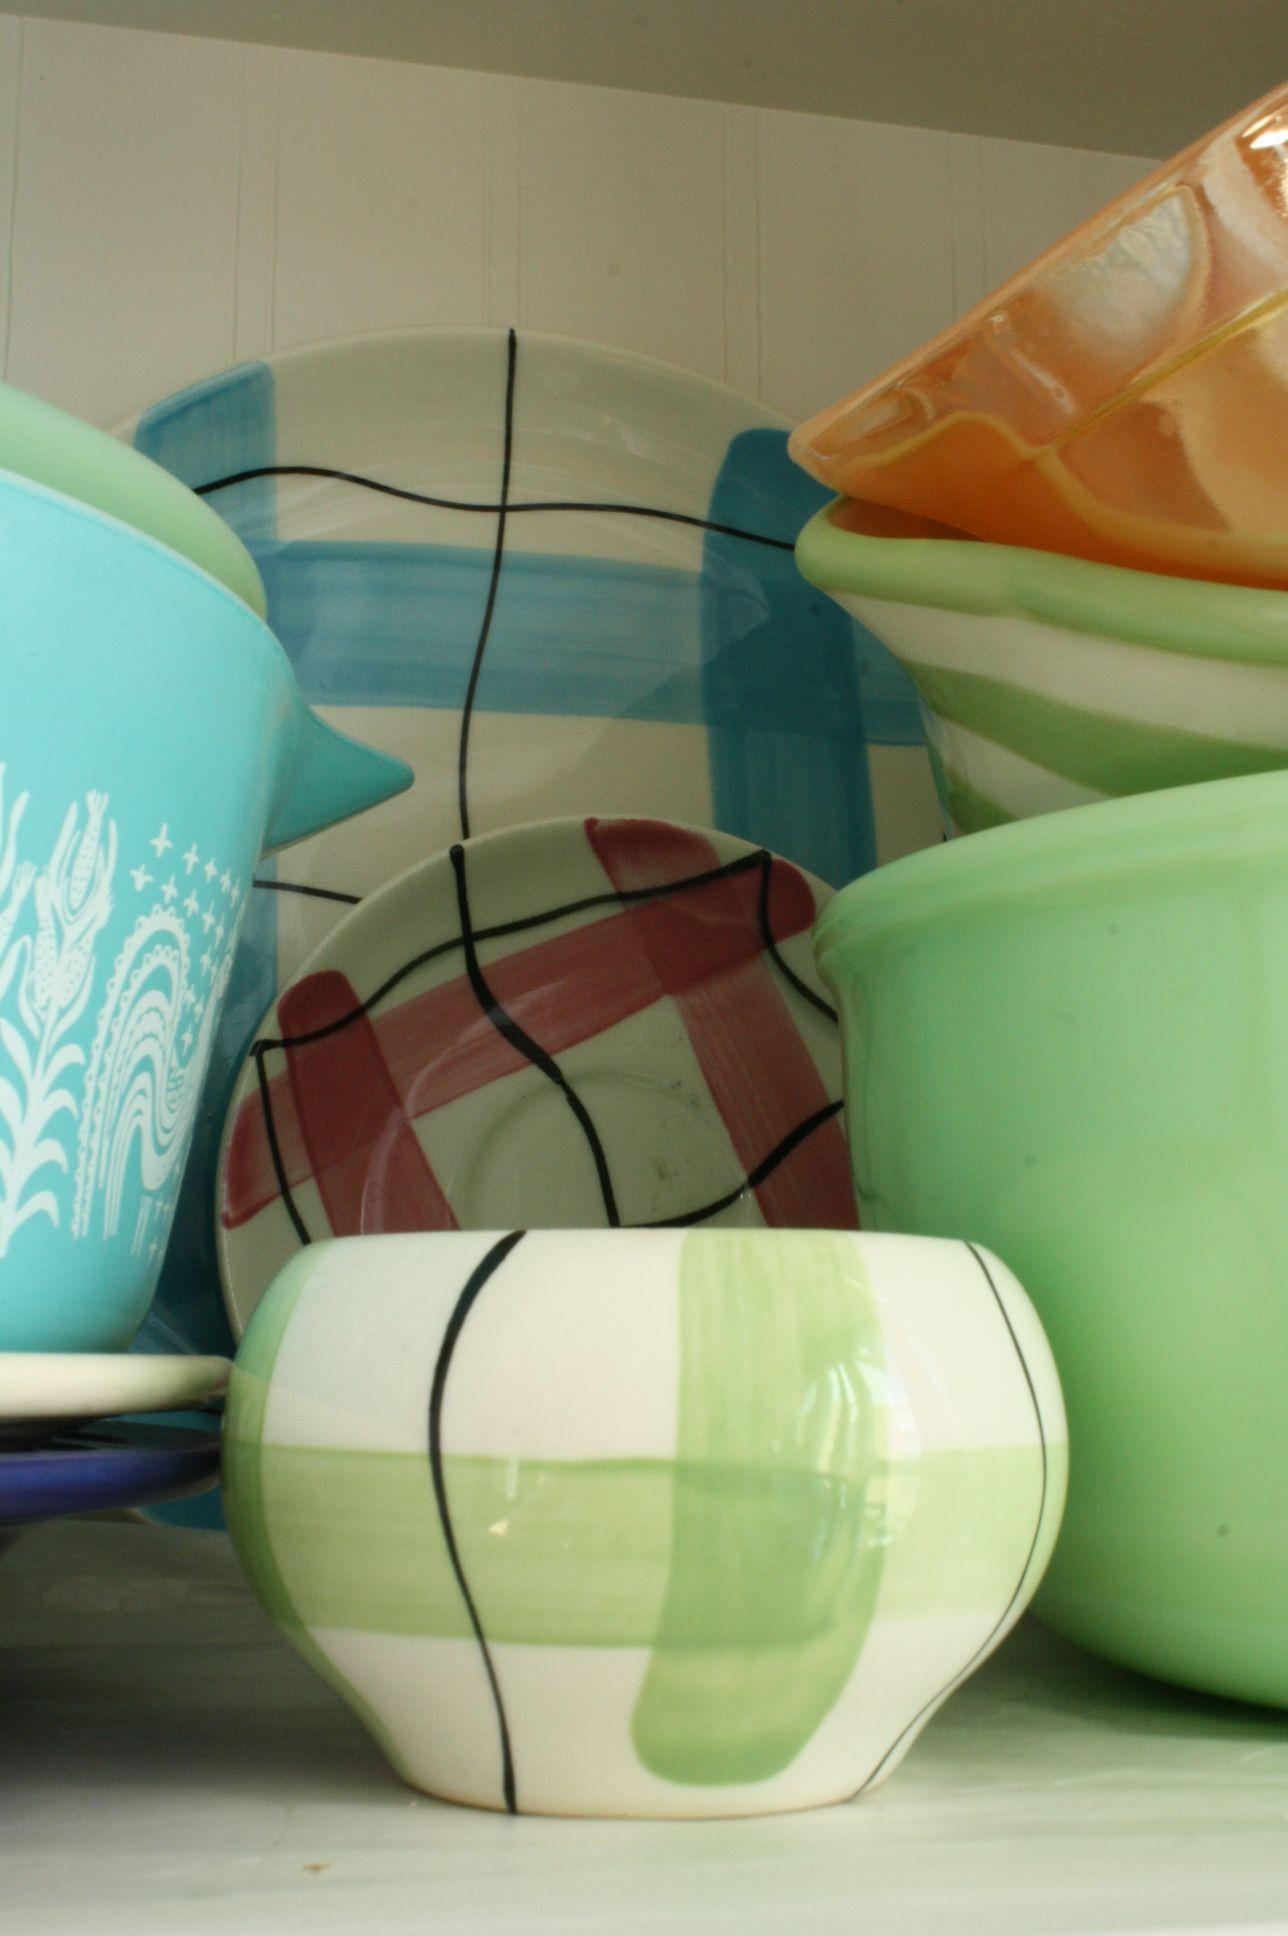 Hycroft medicine hat ab pottery medicine hat ceramics